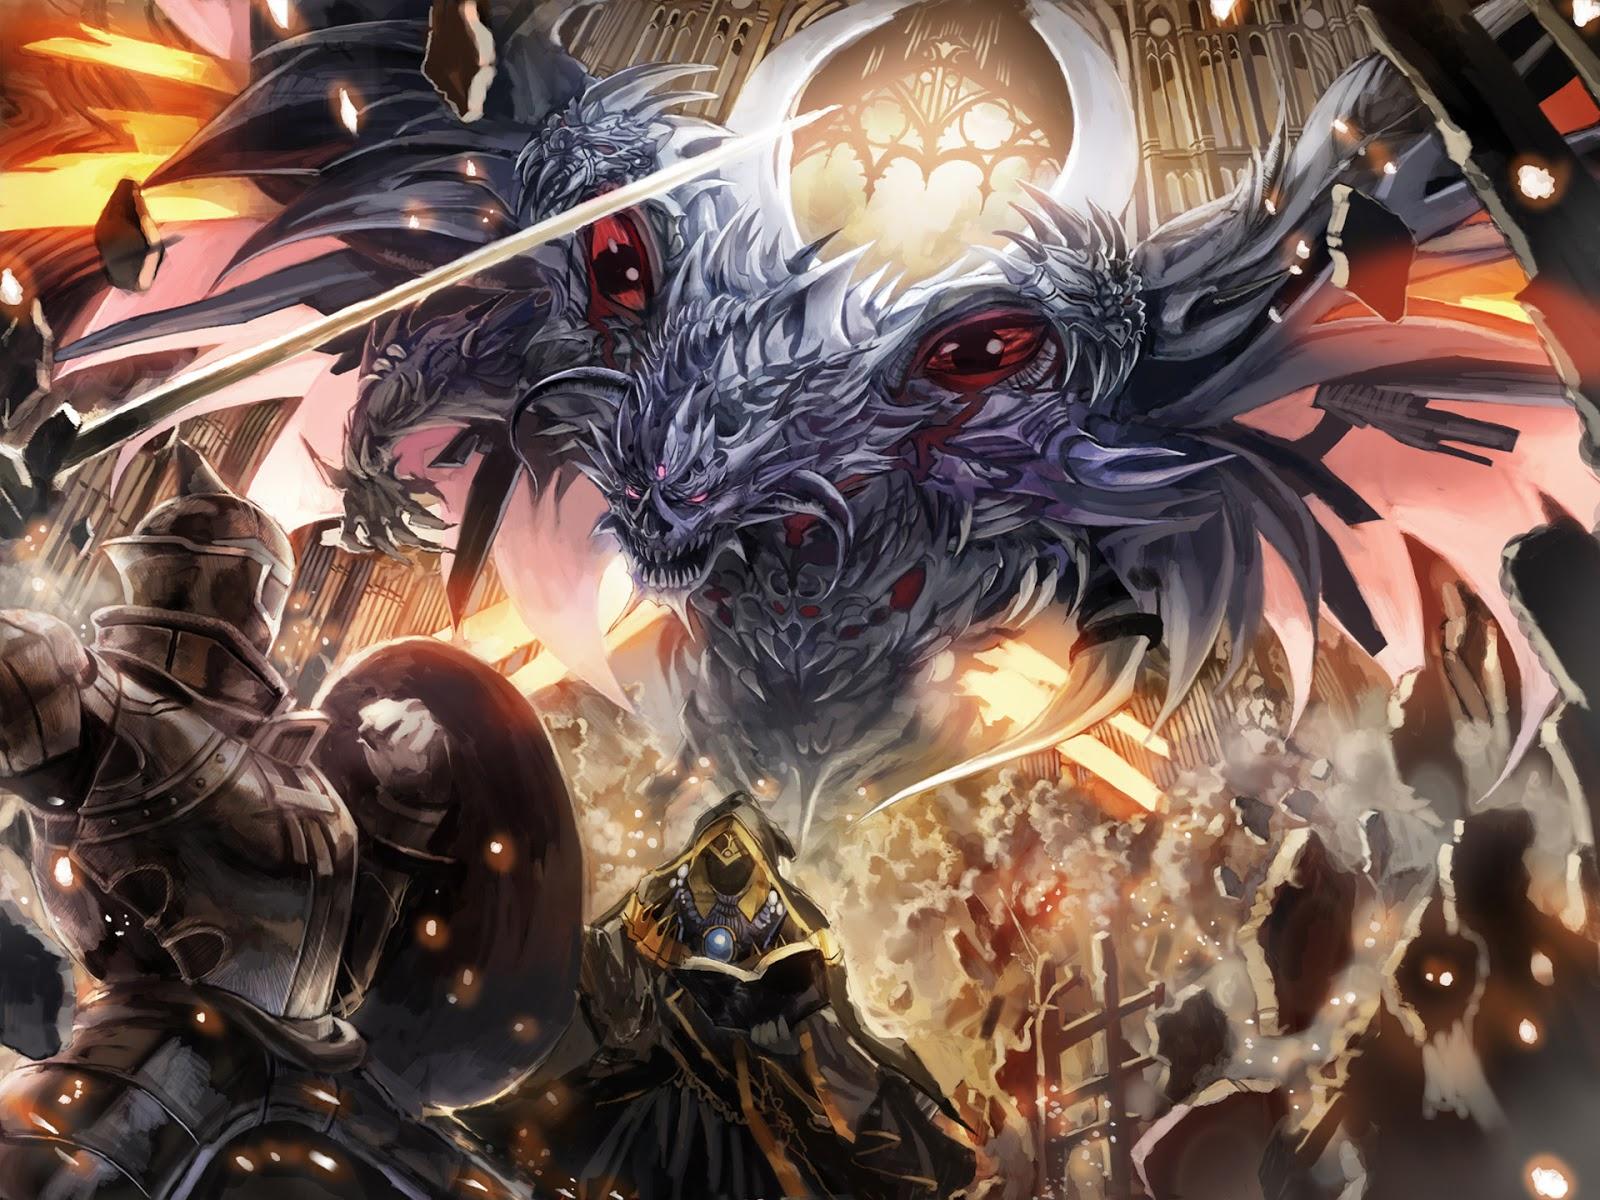 Hd Wallpaper War Monsters Armor Epic Fantasy 1946